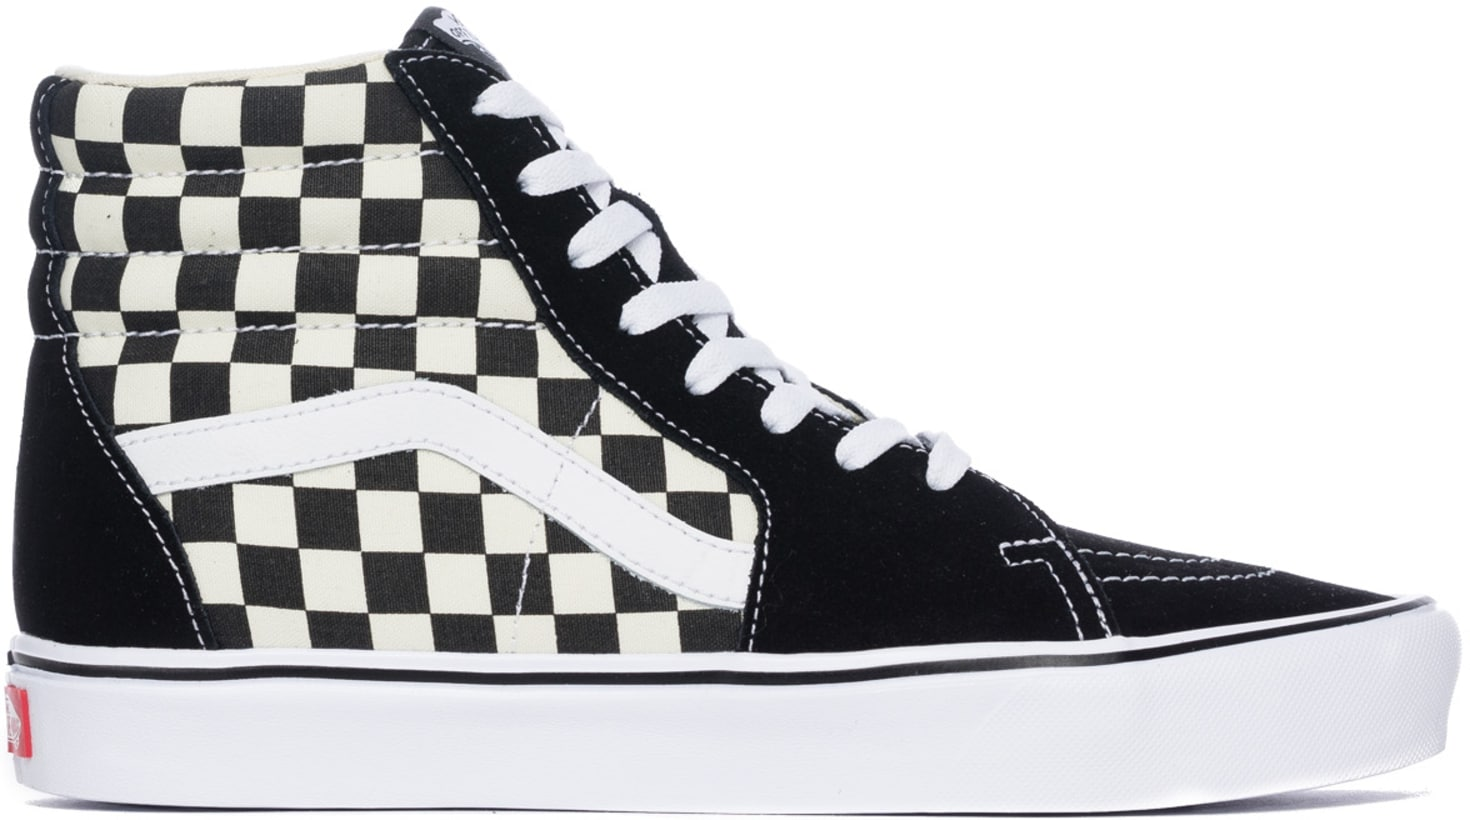 33ded61a8b0369 Vans  Checkerboard SK8-Hi Lite - Black True White